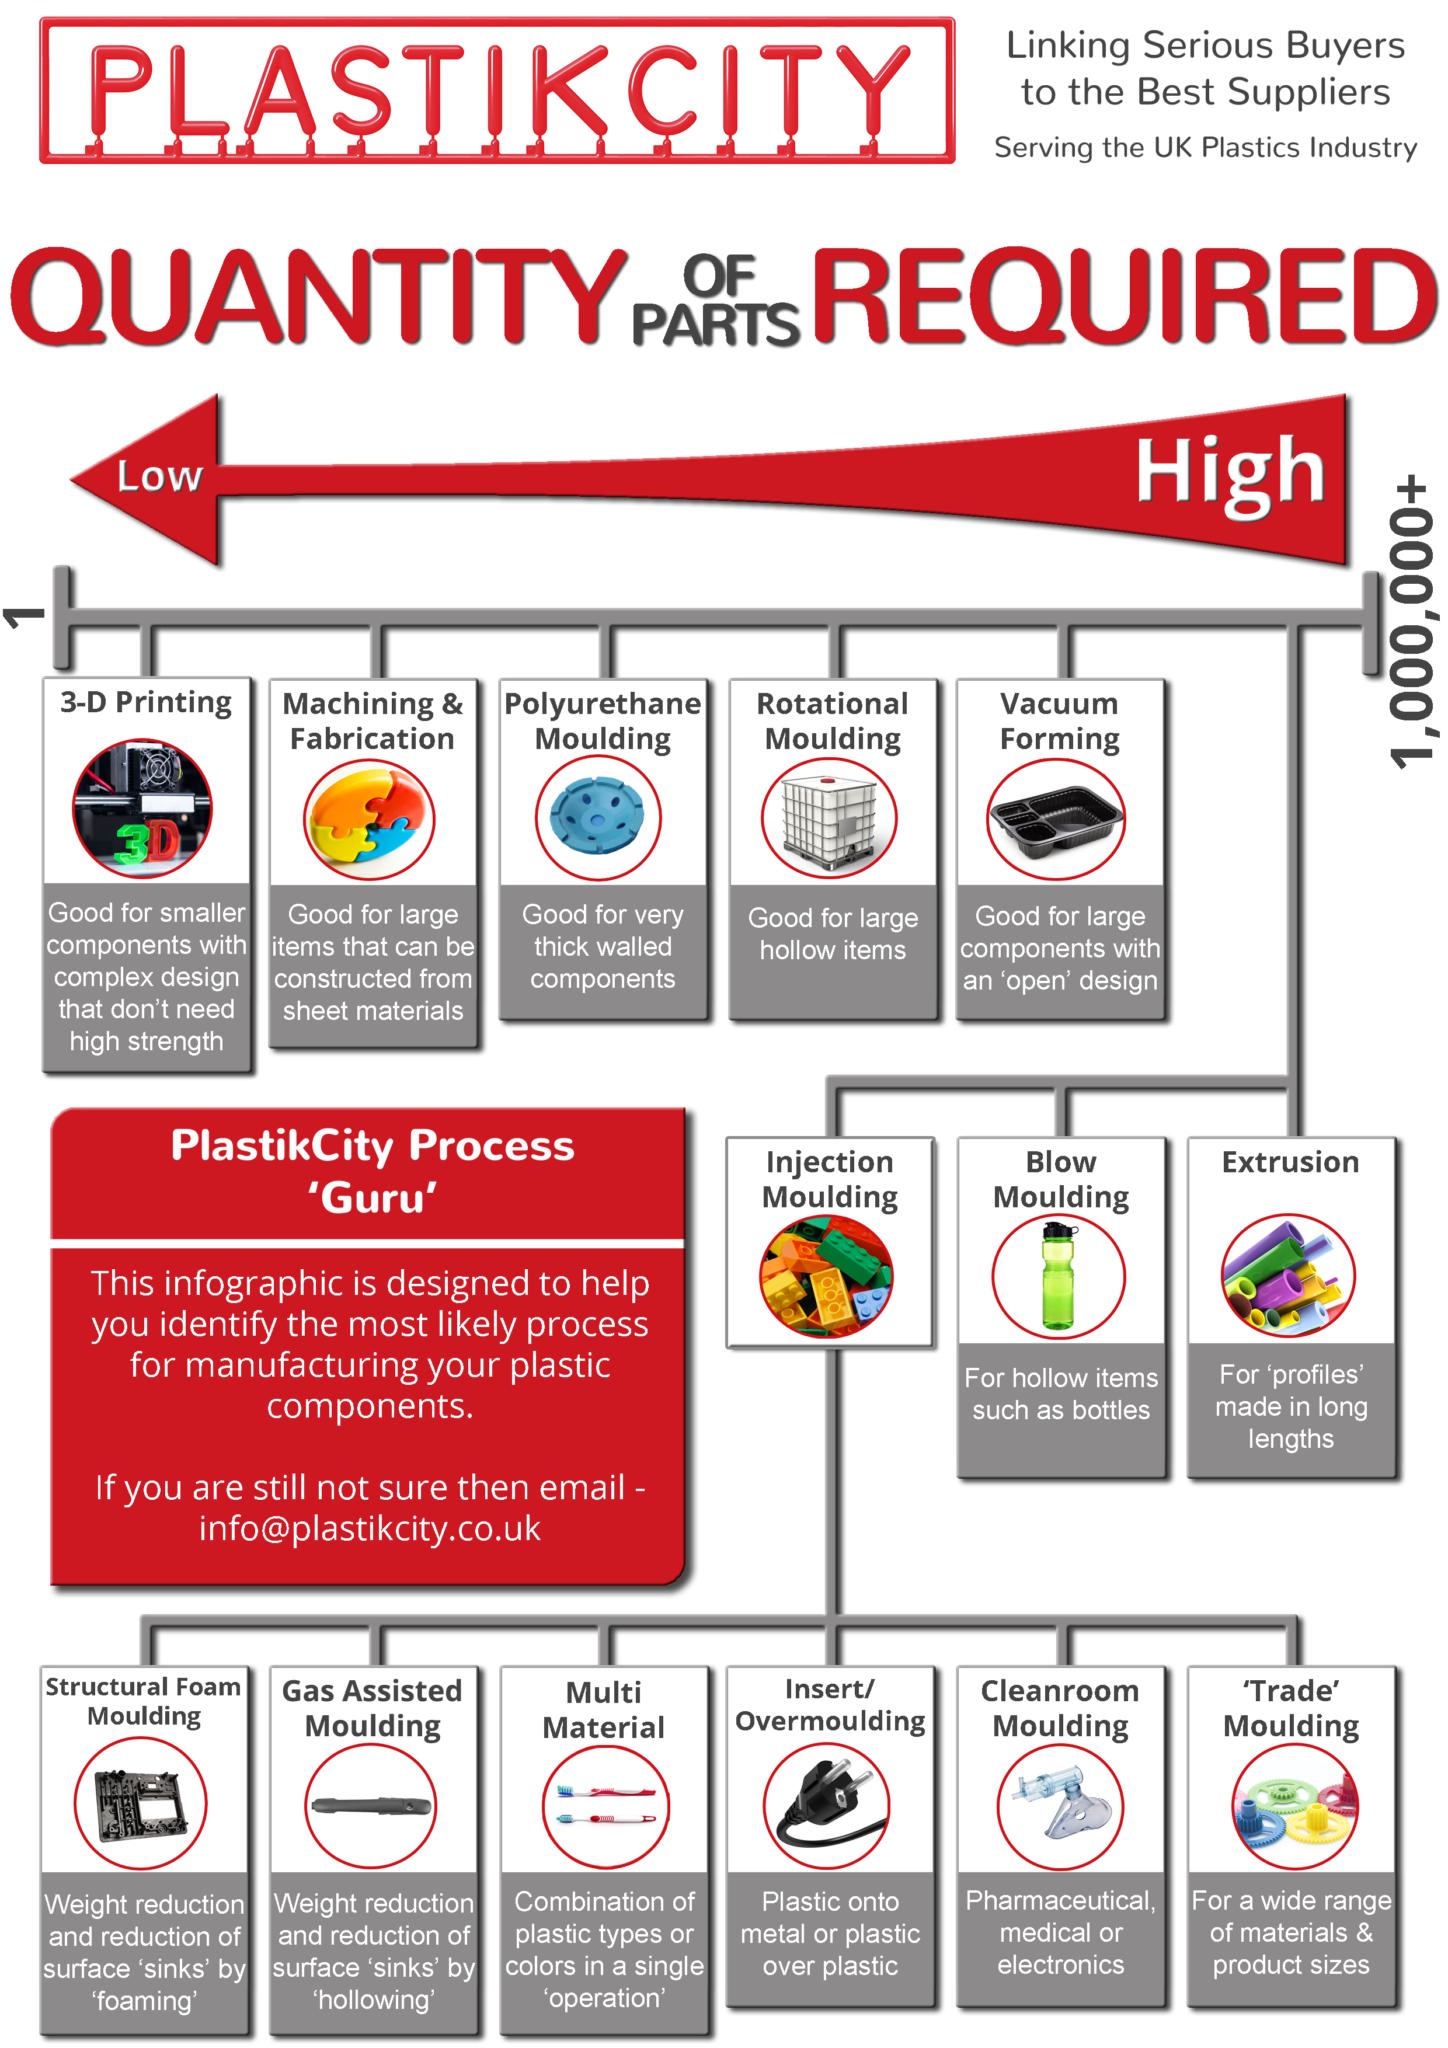 Plastic moulding & plastic manufacturing processes